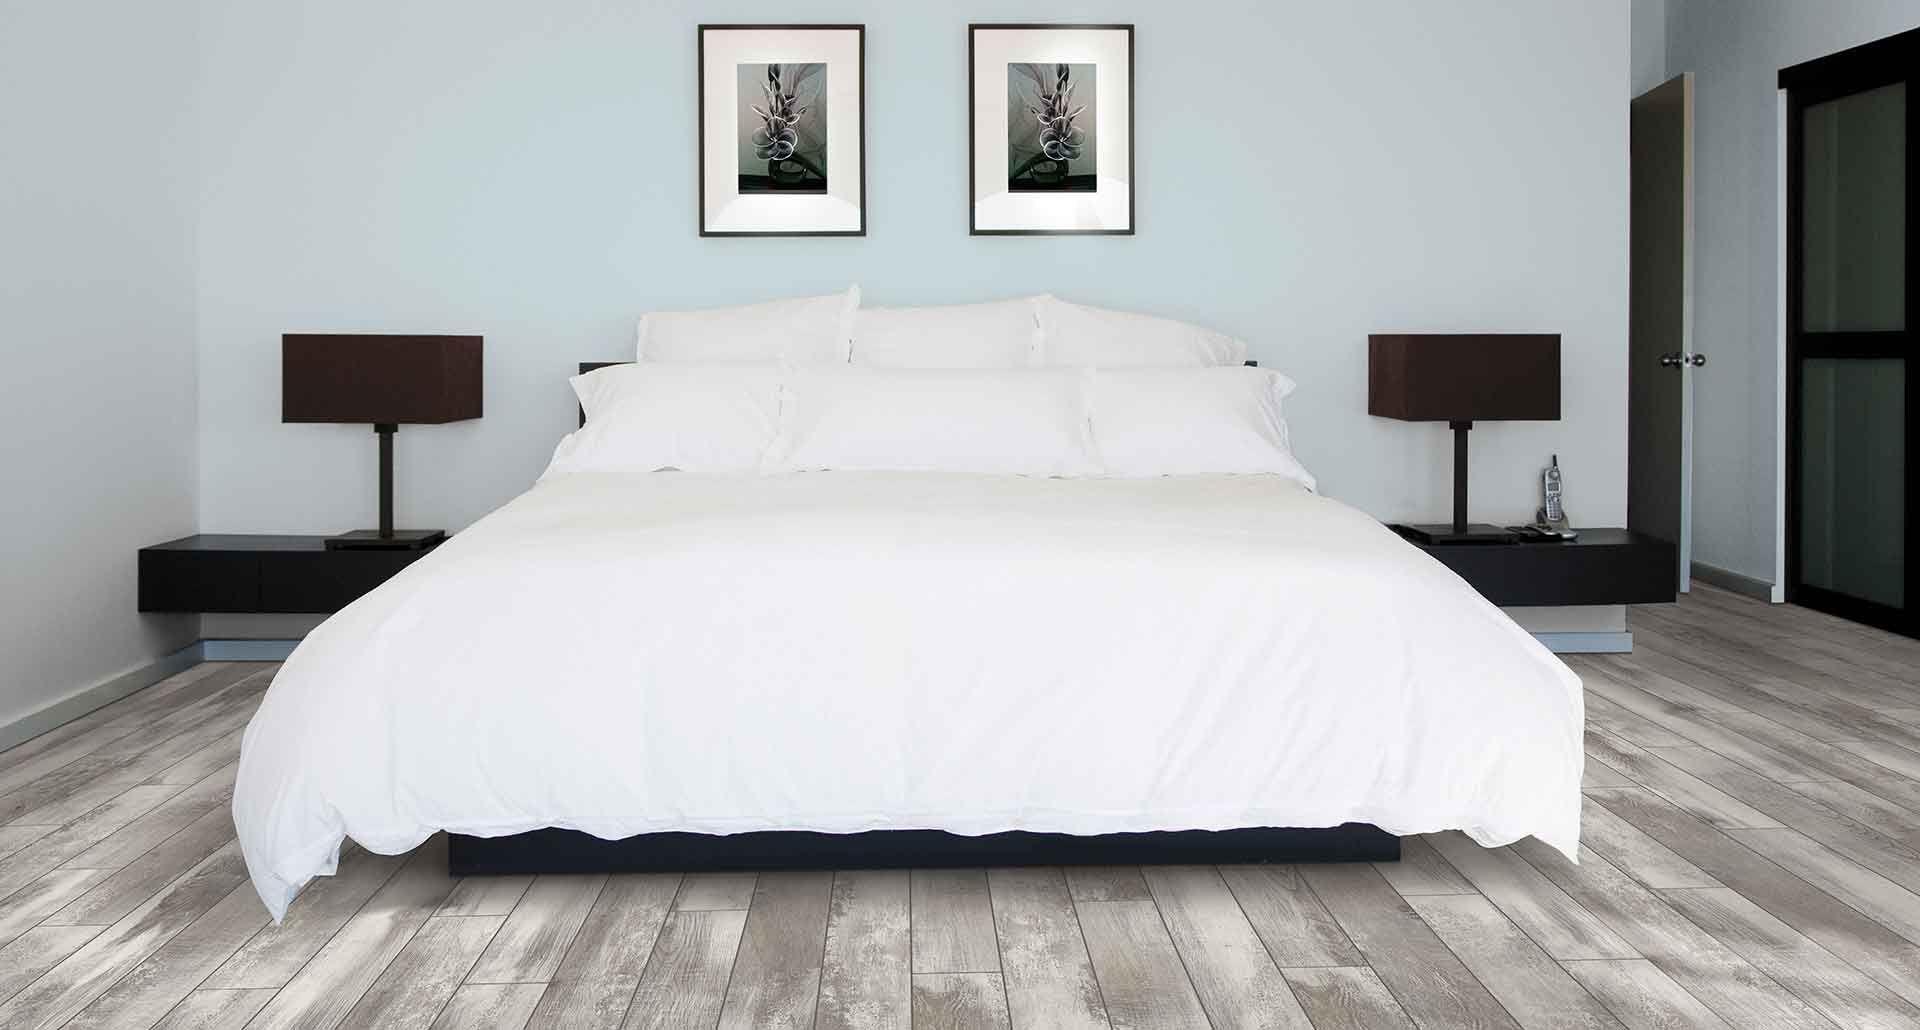 Iceland Oak Grey Textured Laminate Floor Grey Oak Wood Finish 12mm 1 Strip Grey Laminate Flooring Pergo Laminate Flooring Floor Colors